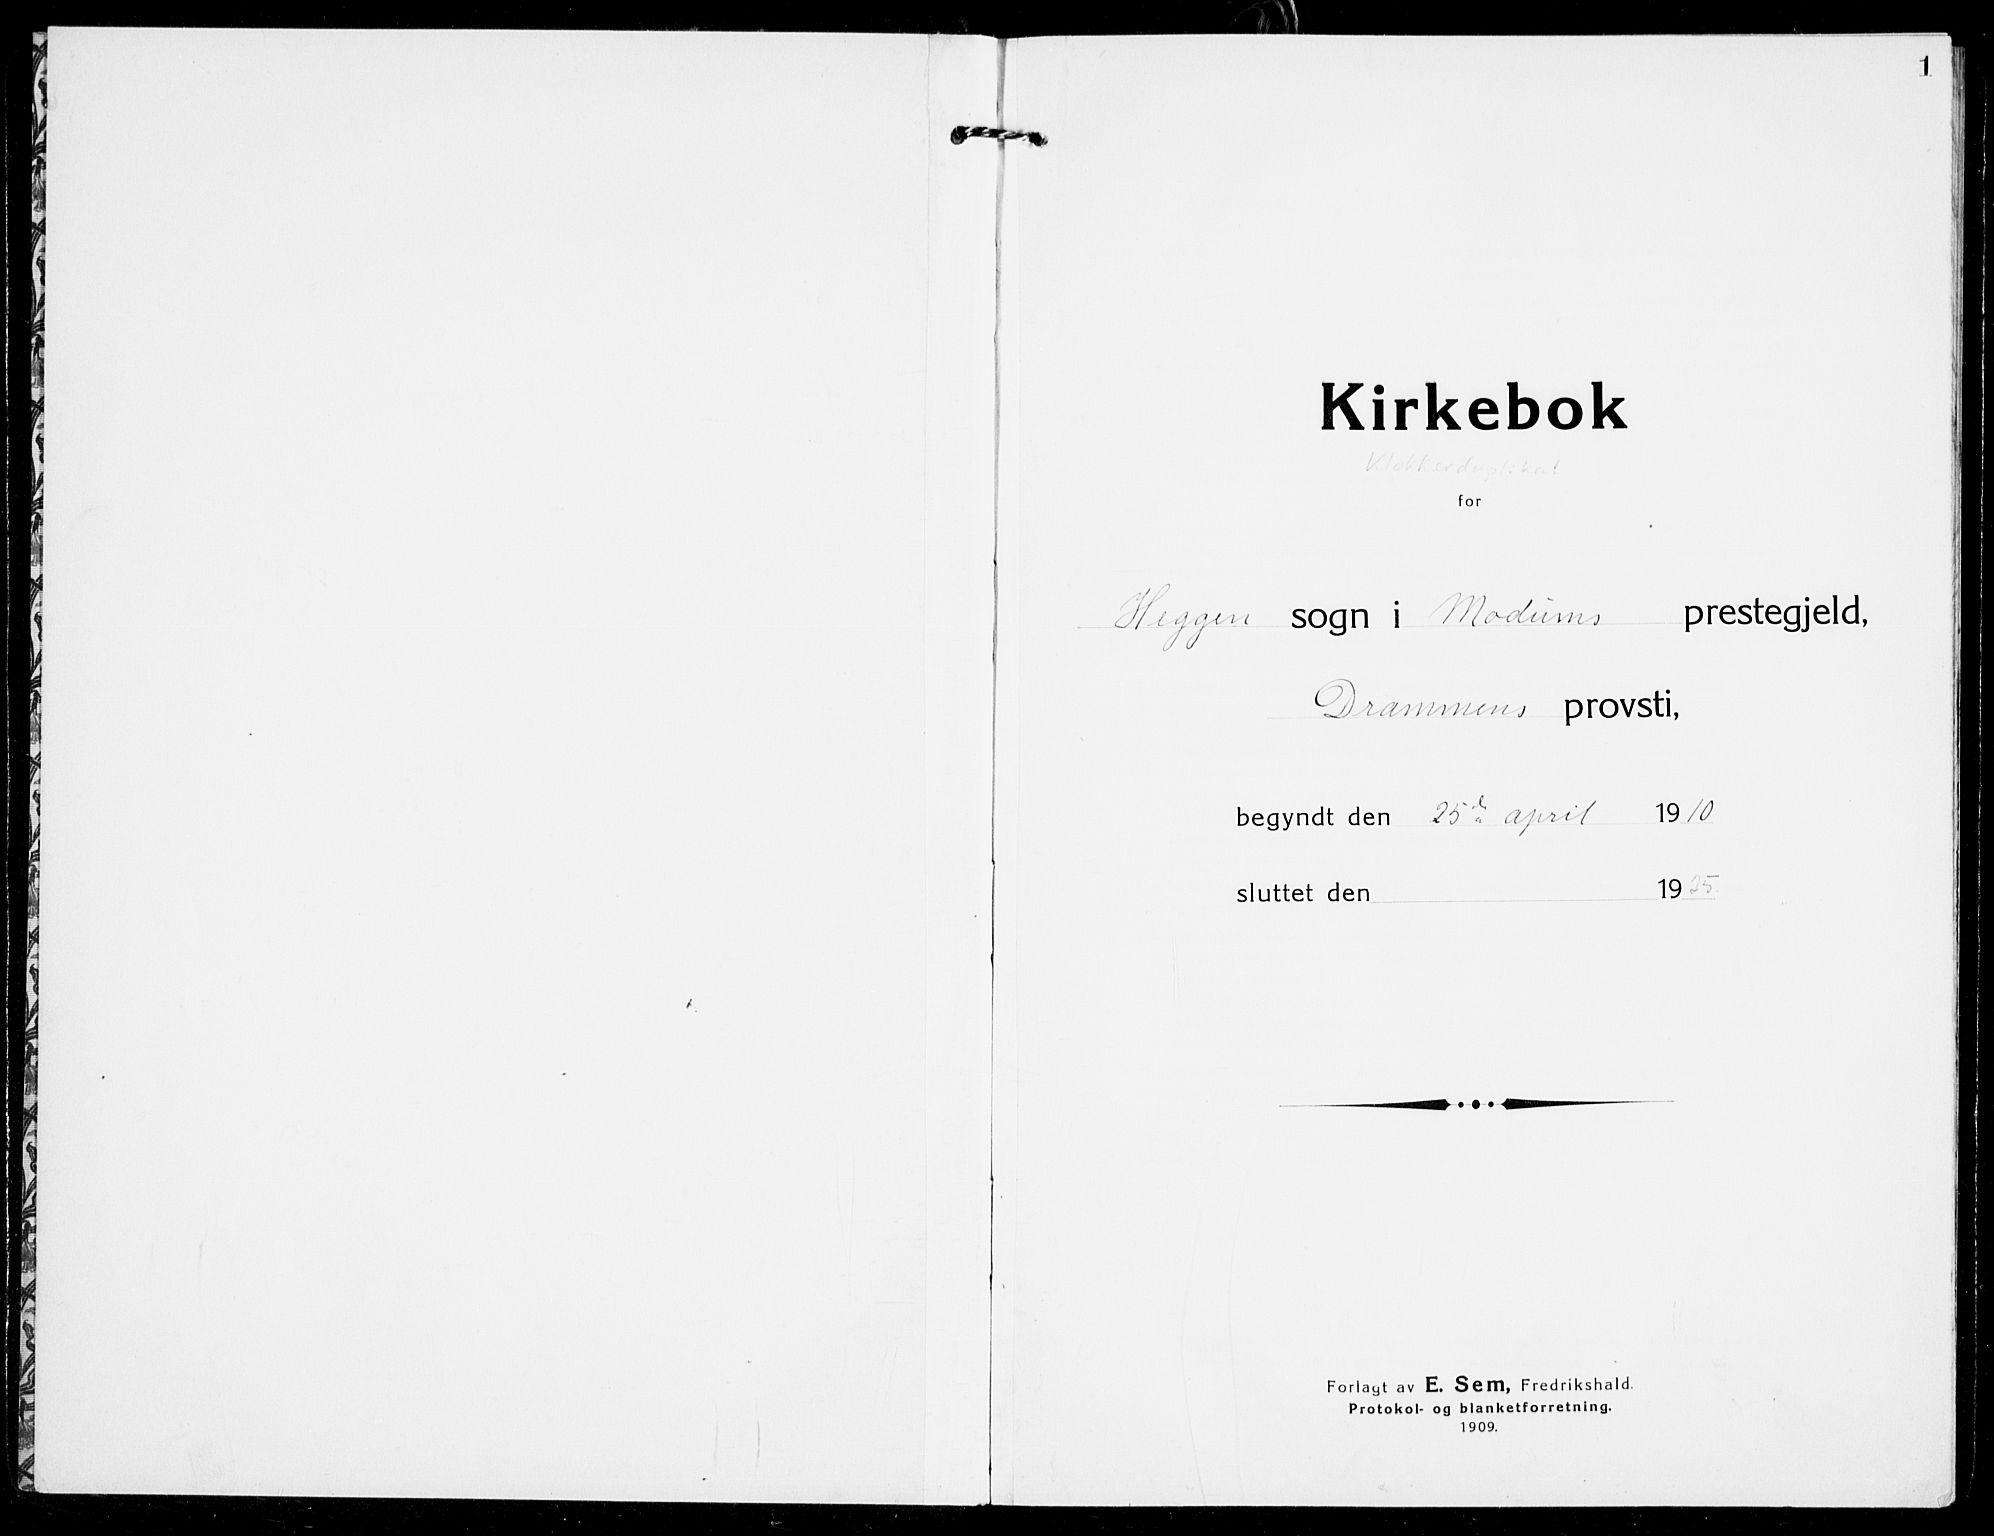 SAKO, Modum kirkebøker, G/Ga/L0011: Parish register (copy) no. I 11, 1910-1925